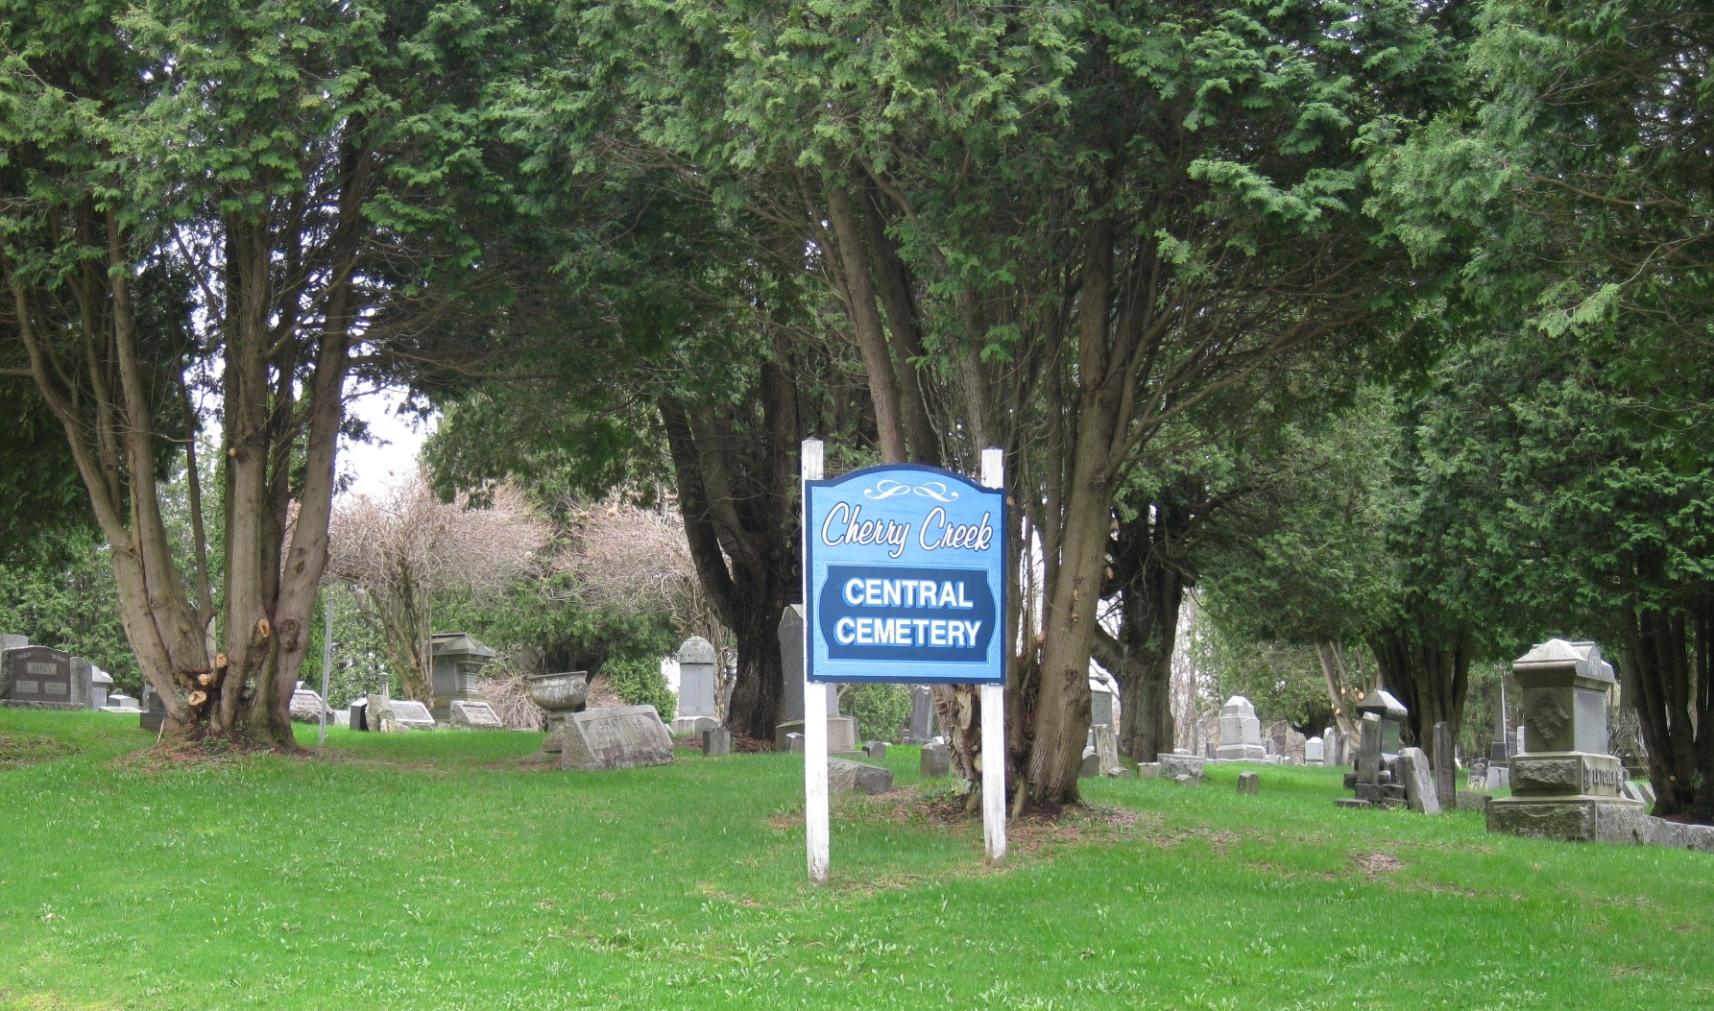 Cherry Creek Central Cemetery